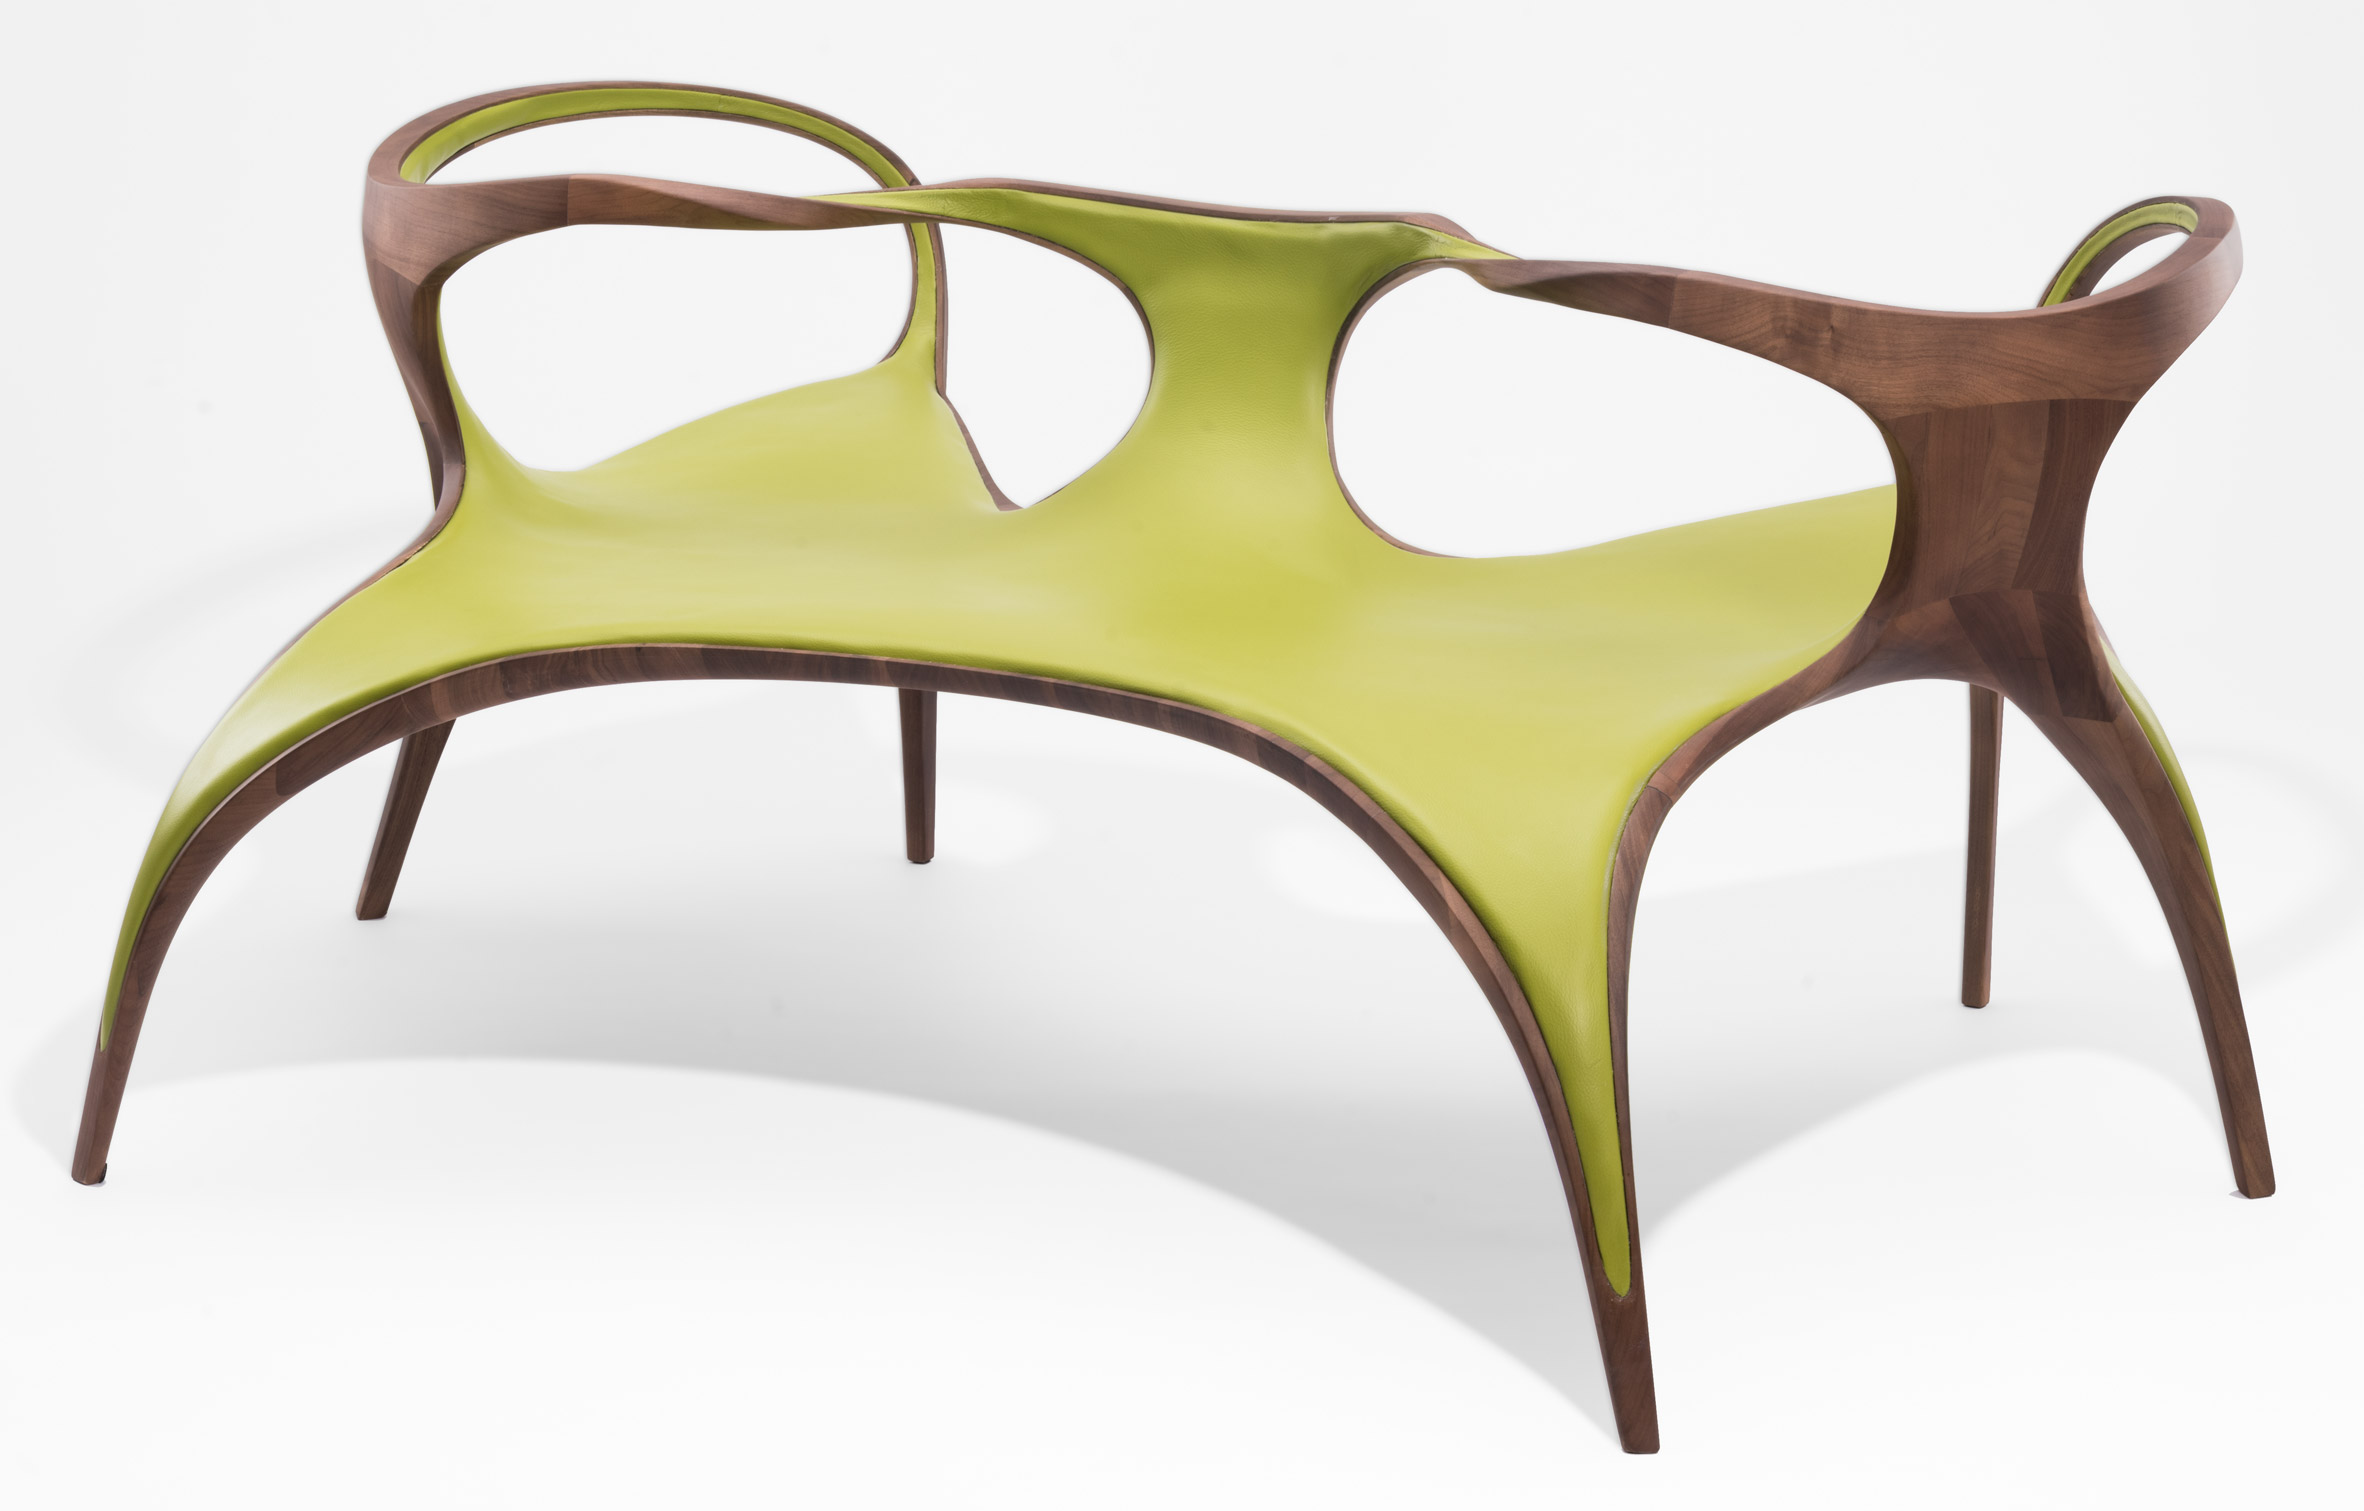 ultrastellar-zaha-hadid-furniture-collection-david-gill-gallery-wood-leather_dezeen_2364_col_7.jpg